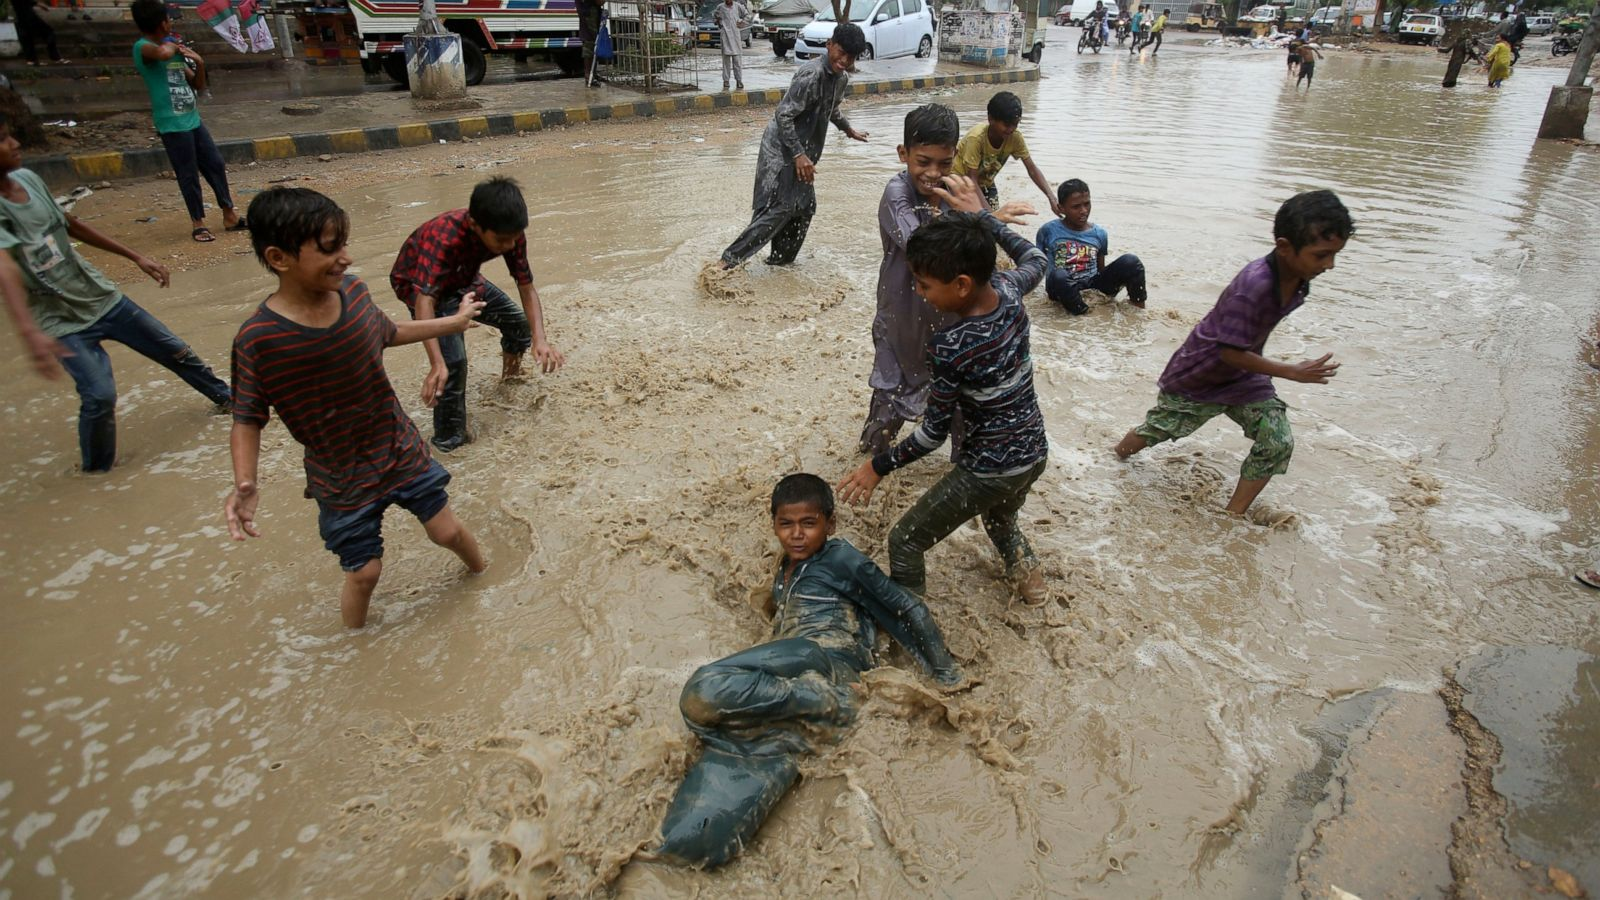 Heavy rain triggers floods in Pakistan's Karachi, killing 6 - ABC News